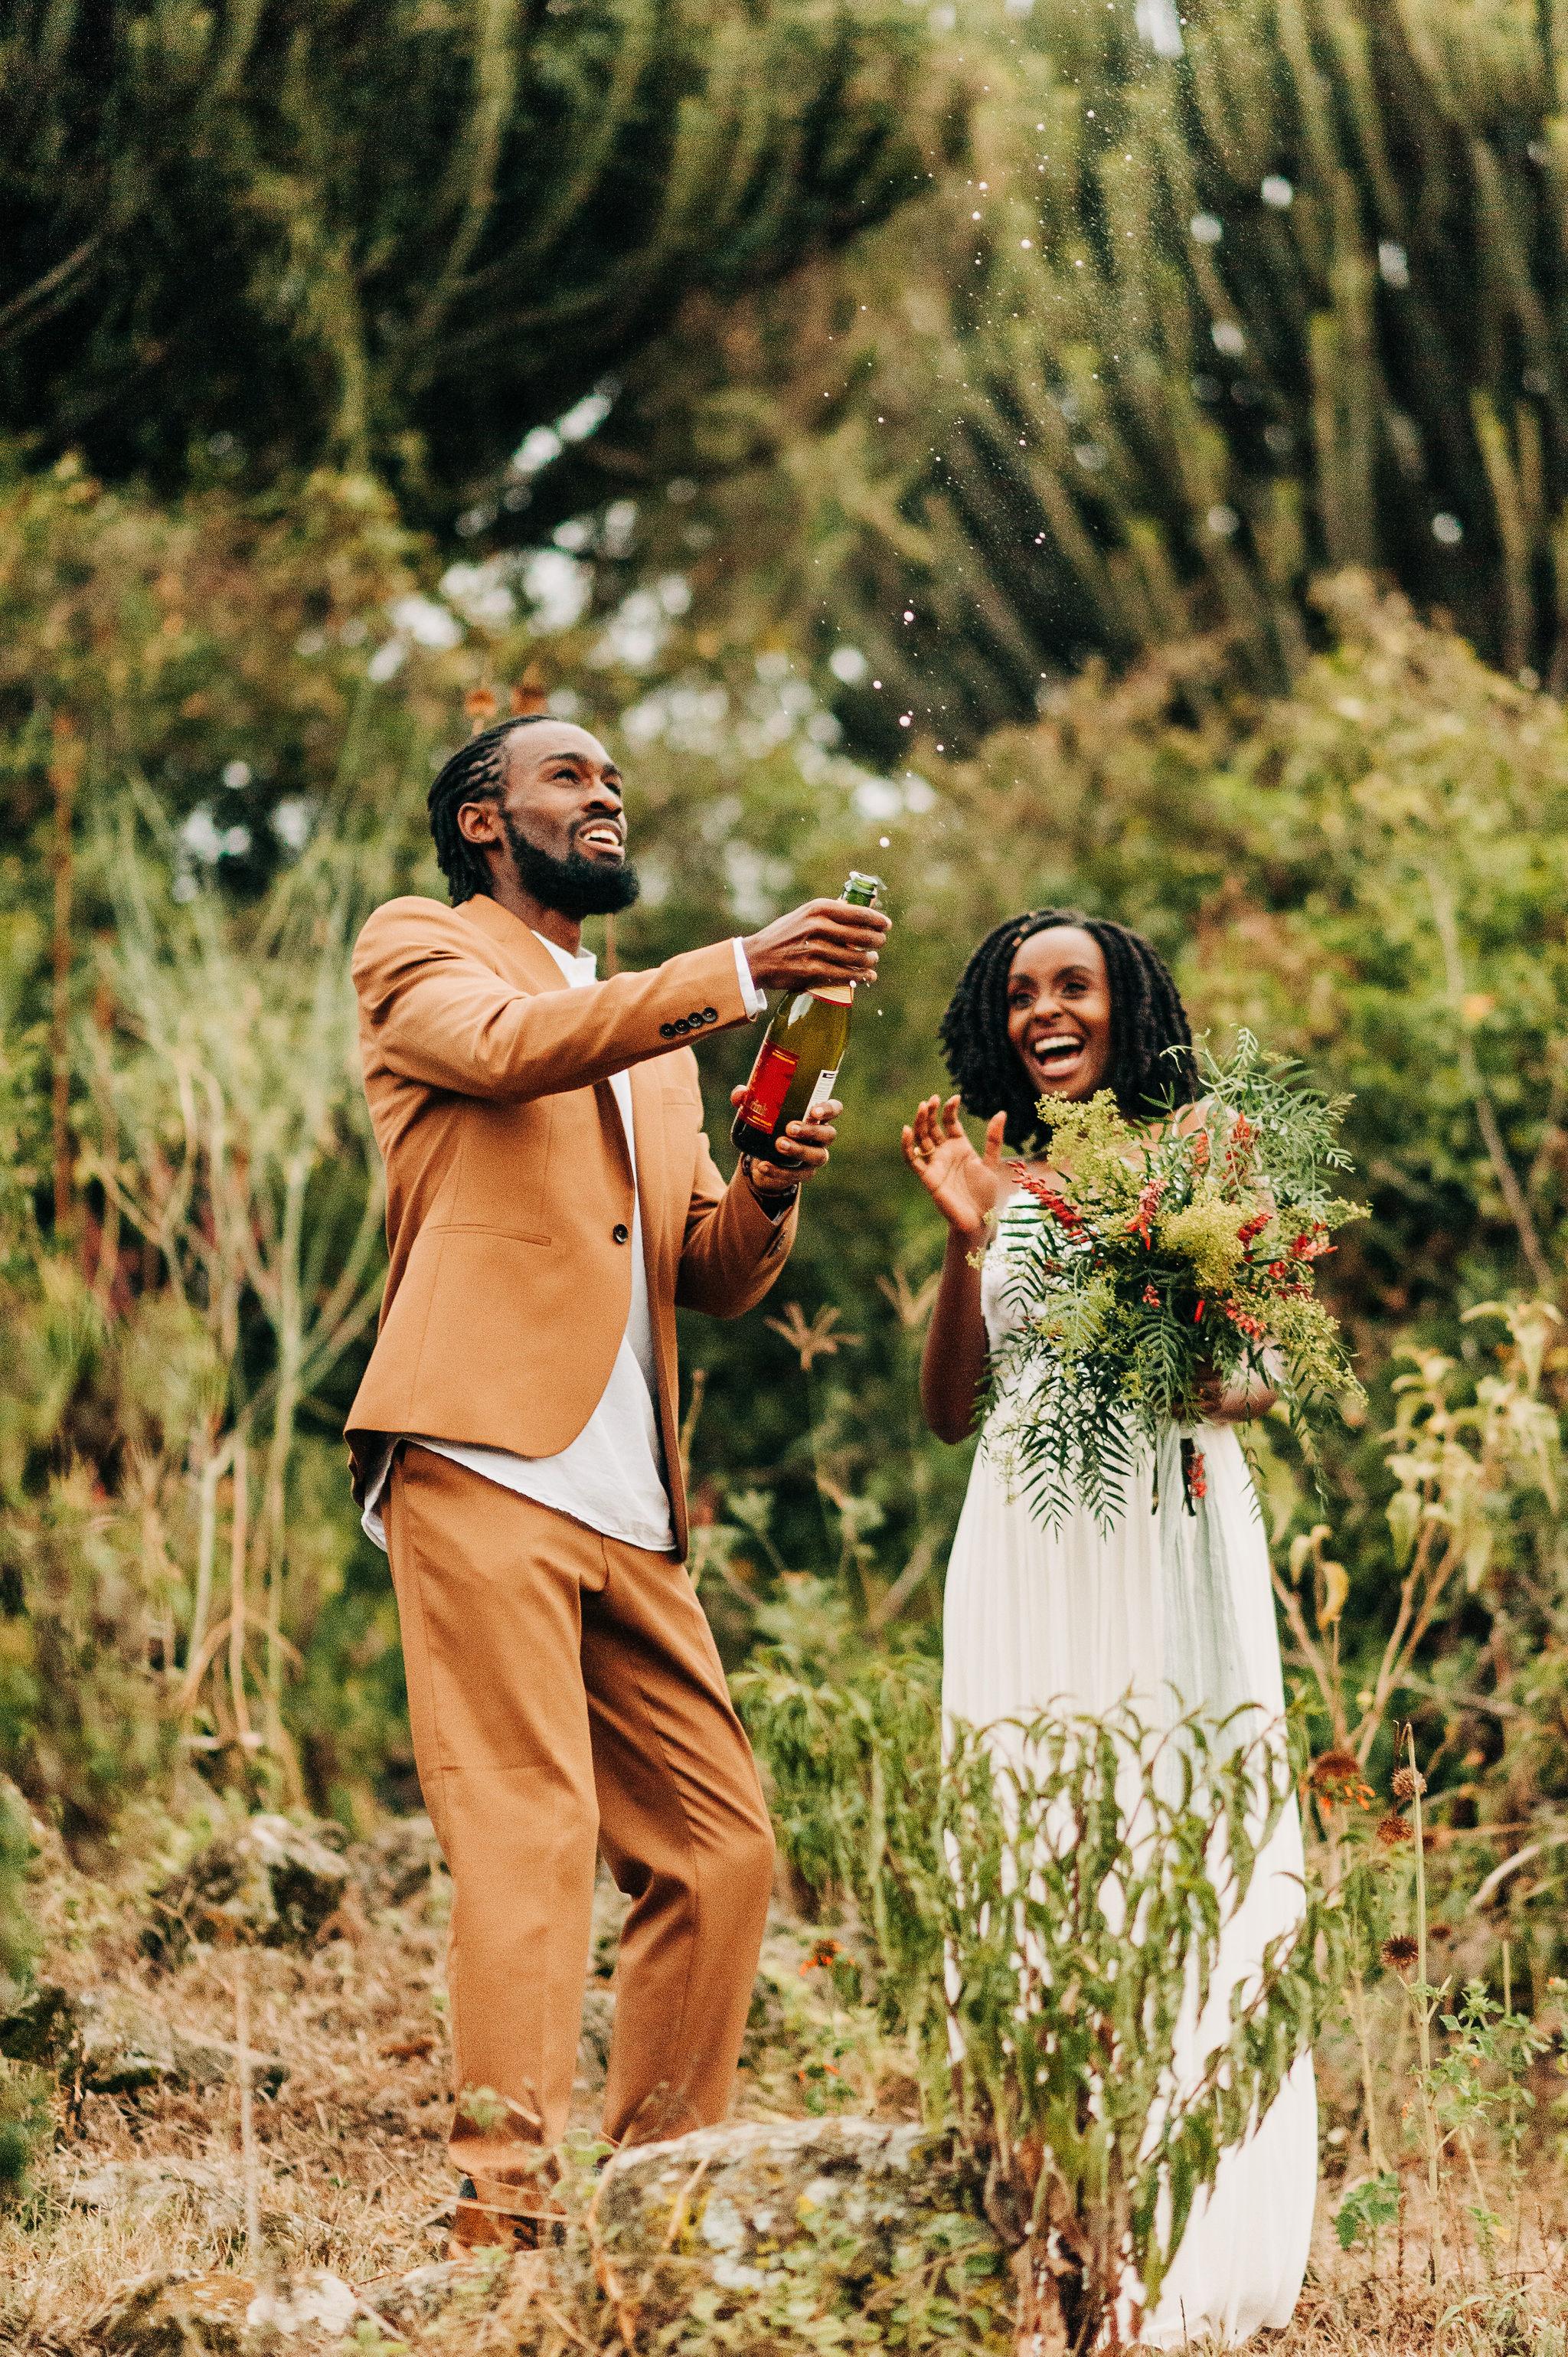 Anna-Hari-Photography-Destination-Wedding-Photographer-Kenya-198.jpg